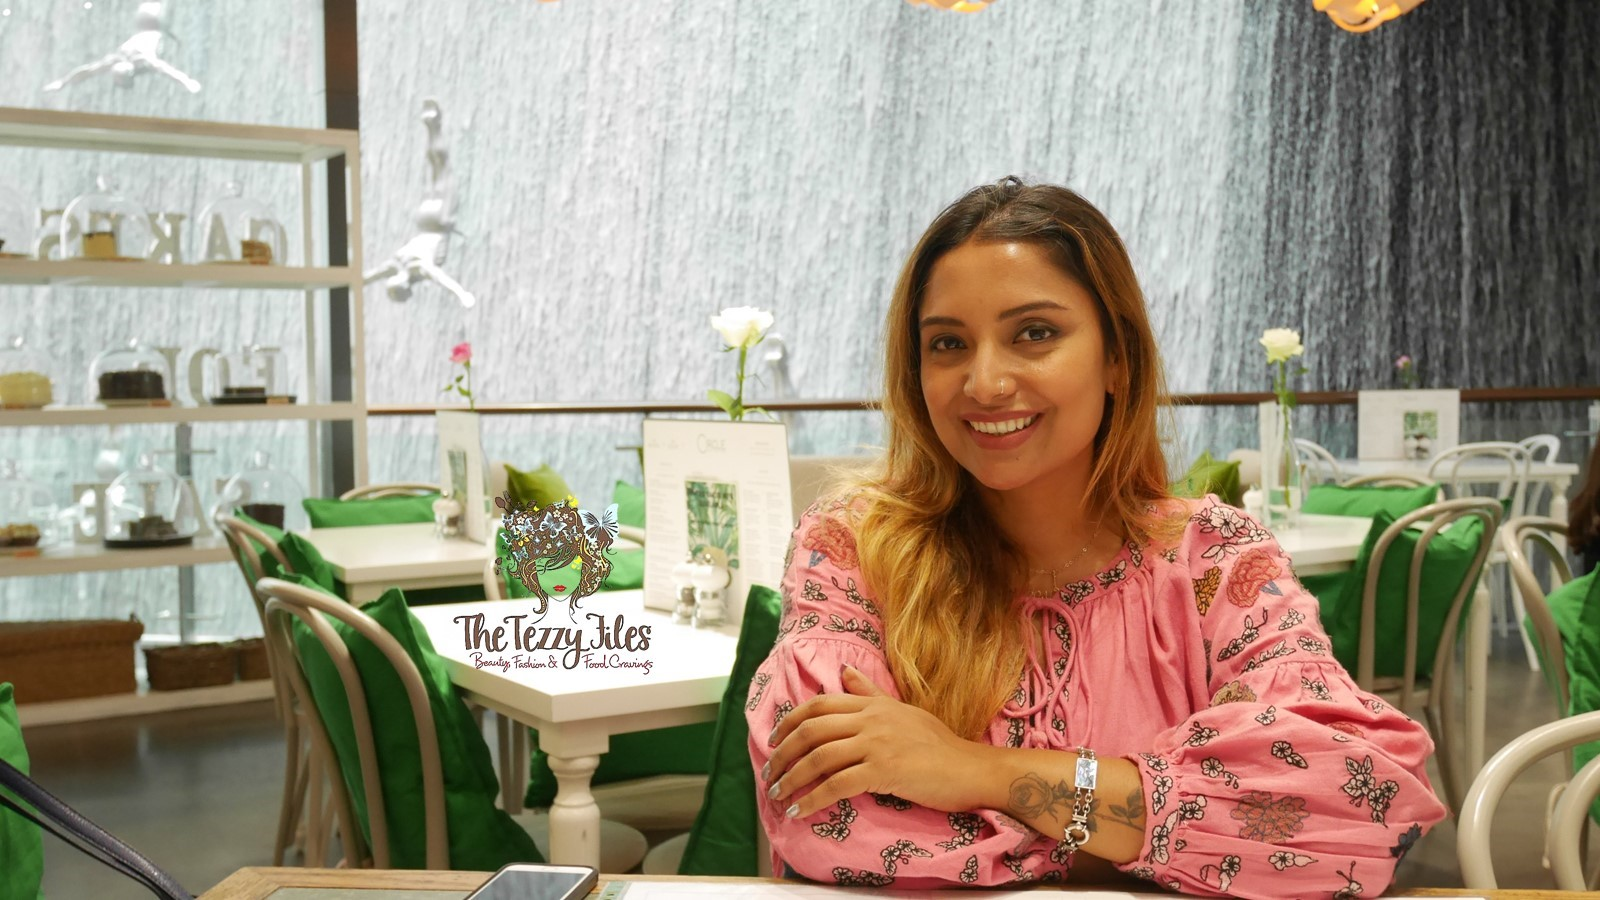 03ae3281f2ba ... Dubai Blog The Tezzy Files (3)Circle Cafe Review The Dubai Mall  WaterFall Food Blog UAE Lifestyle Blogger Dubai Blog The Tezzy Files  (2)Circle Cafe Menu ...